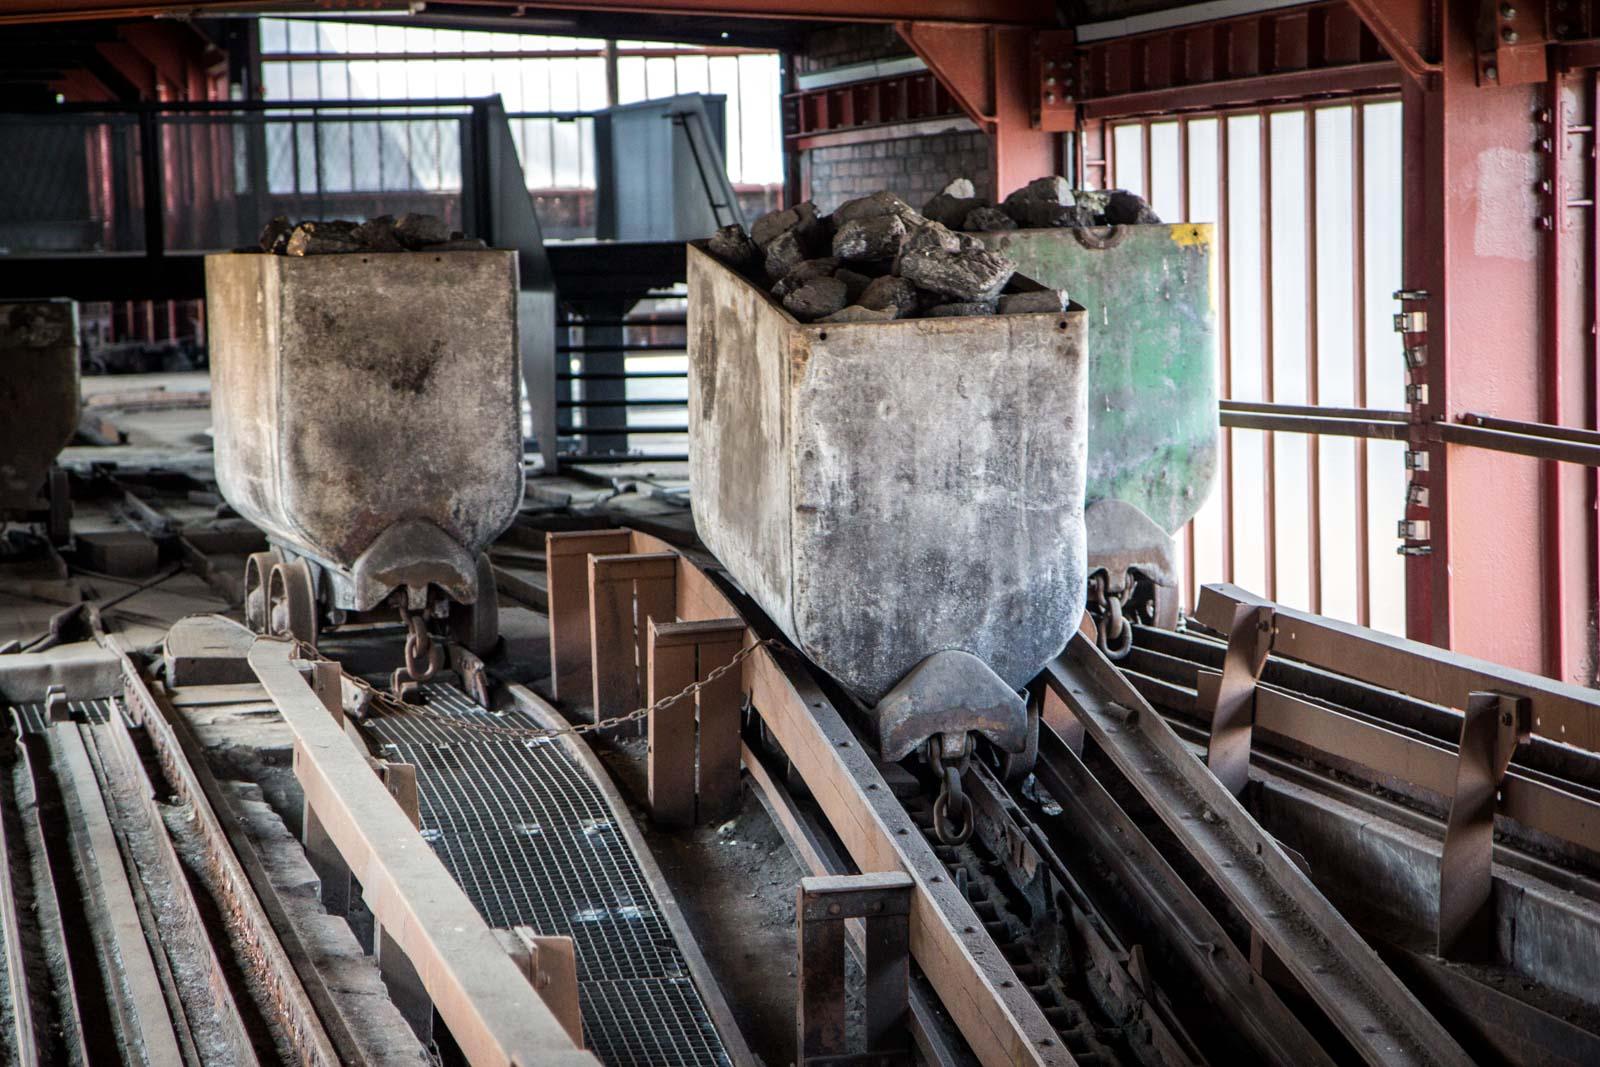 Zollverein Coal Mine, Essen, Germany